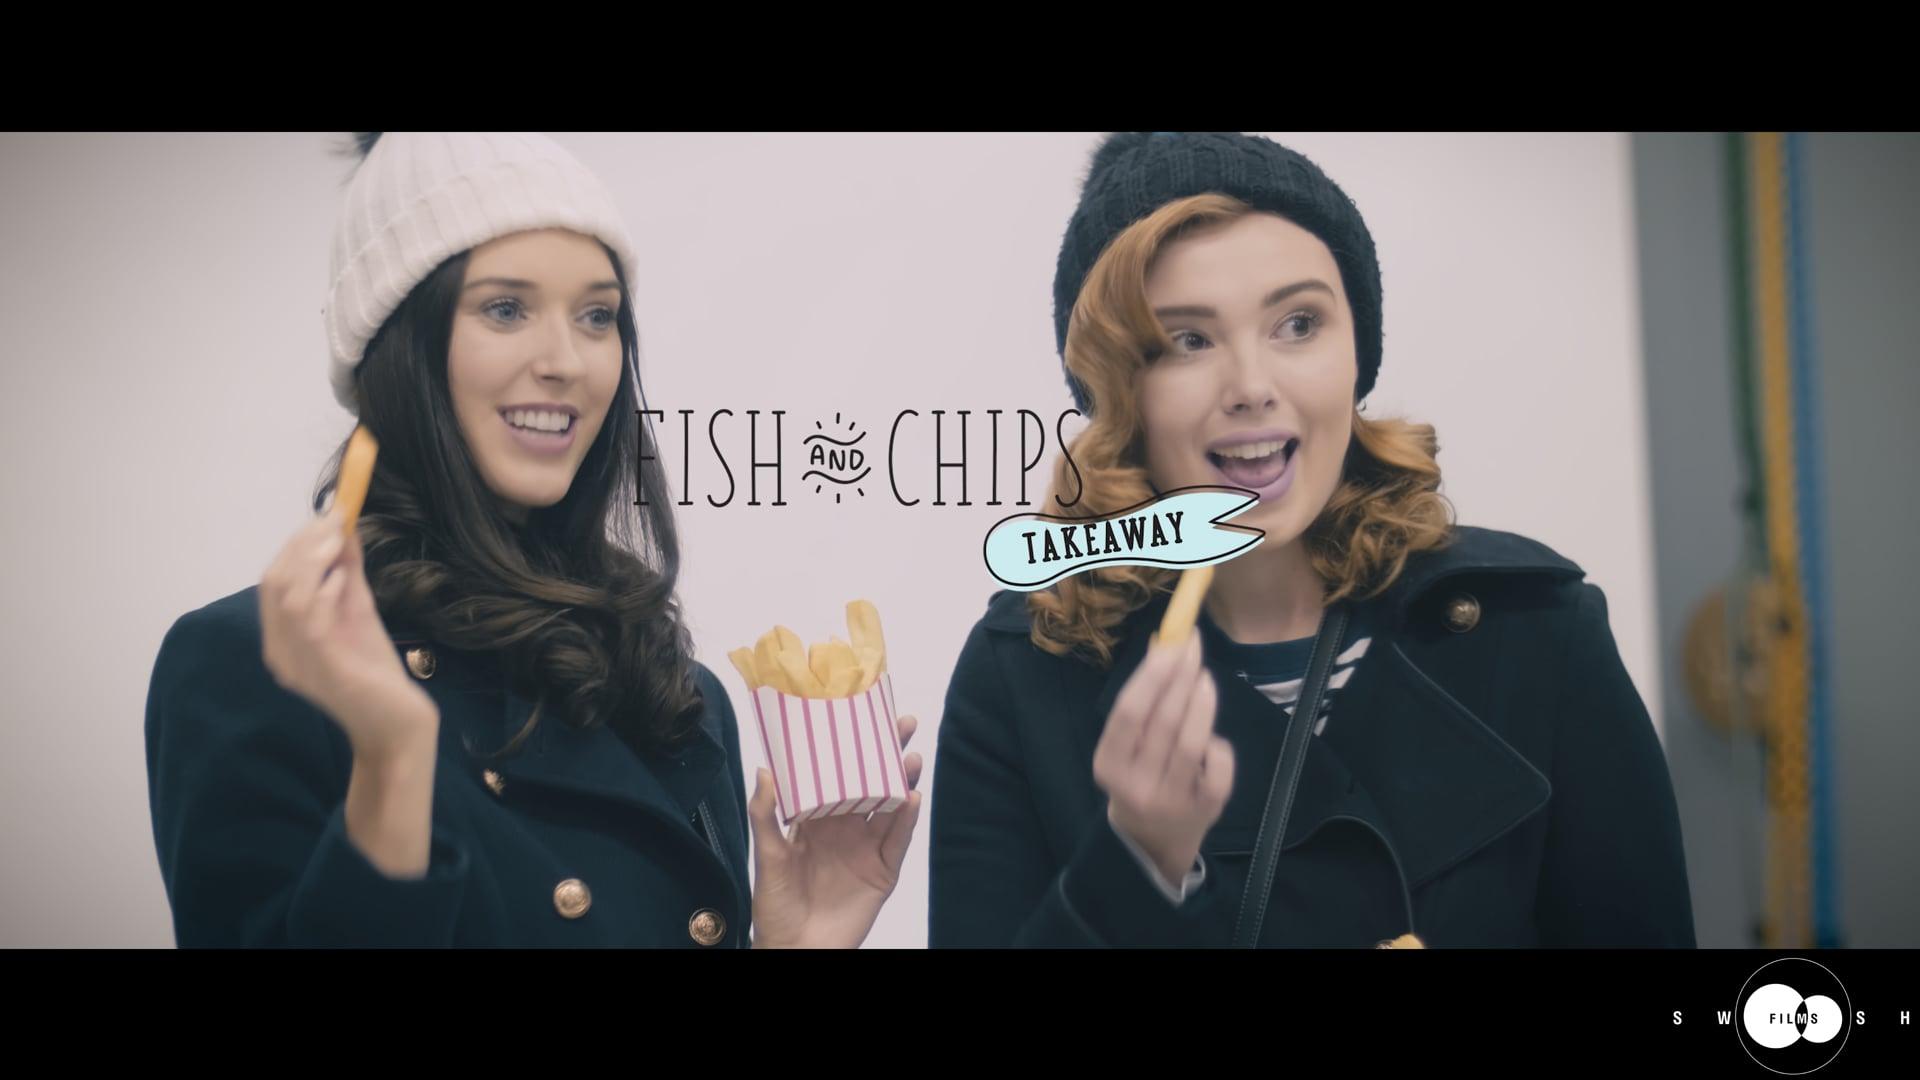 Vendula Instagram Teaser#2 - Fish And Chips